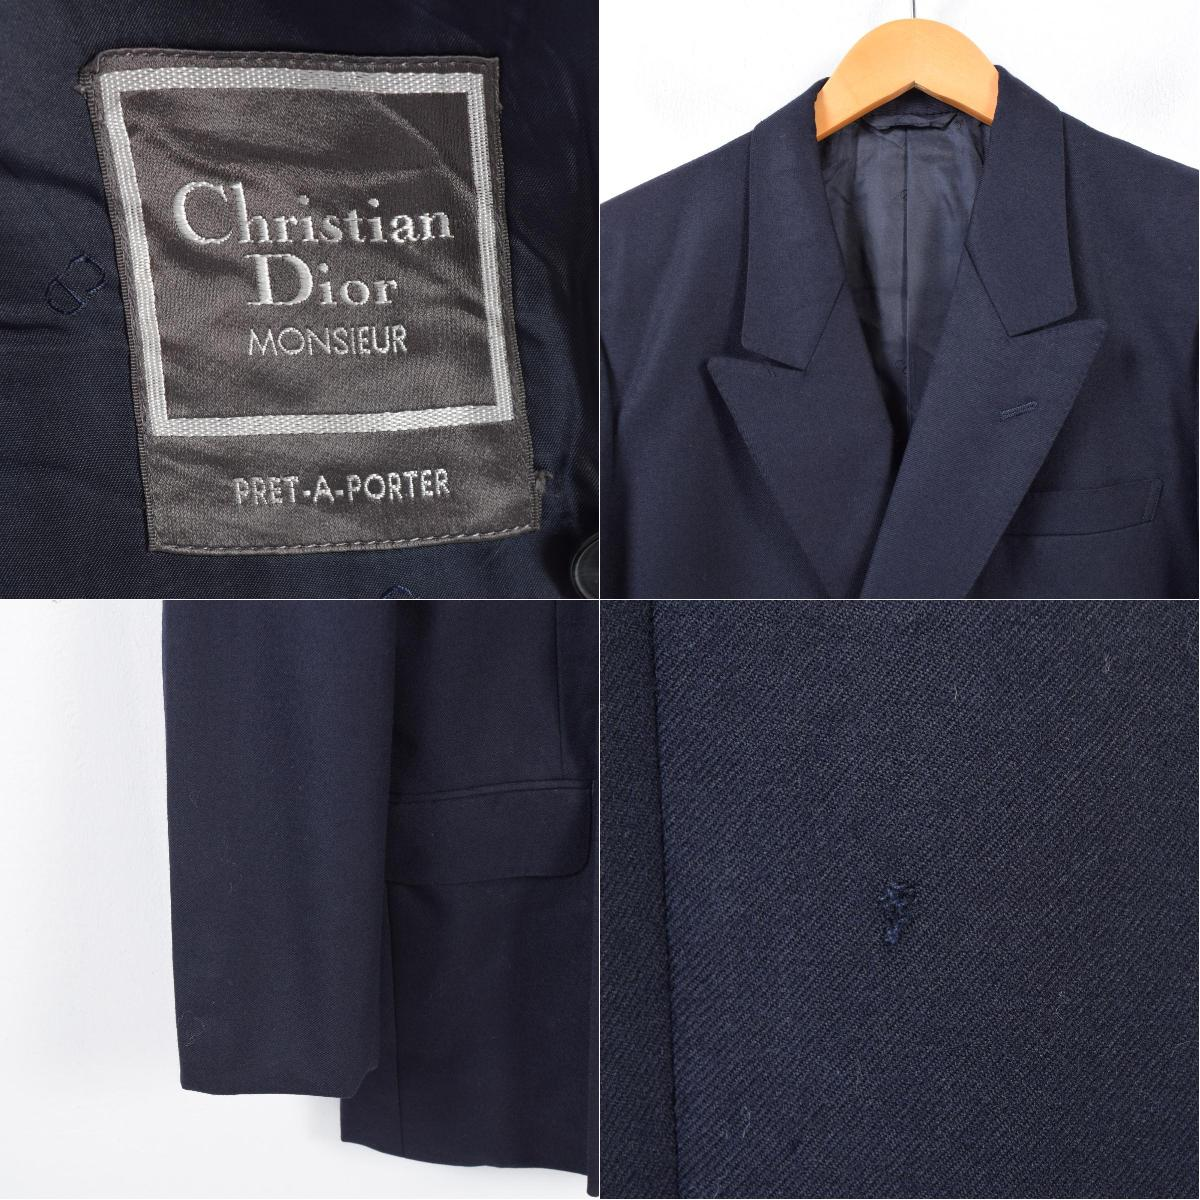 best cheap 9eaa0 78a57 クリスチャンディオール Christian Dior MONSIEUR ダブルブレスト ピークドラペル テーラードジャケット レディースM  /waj3536 【171113】